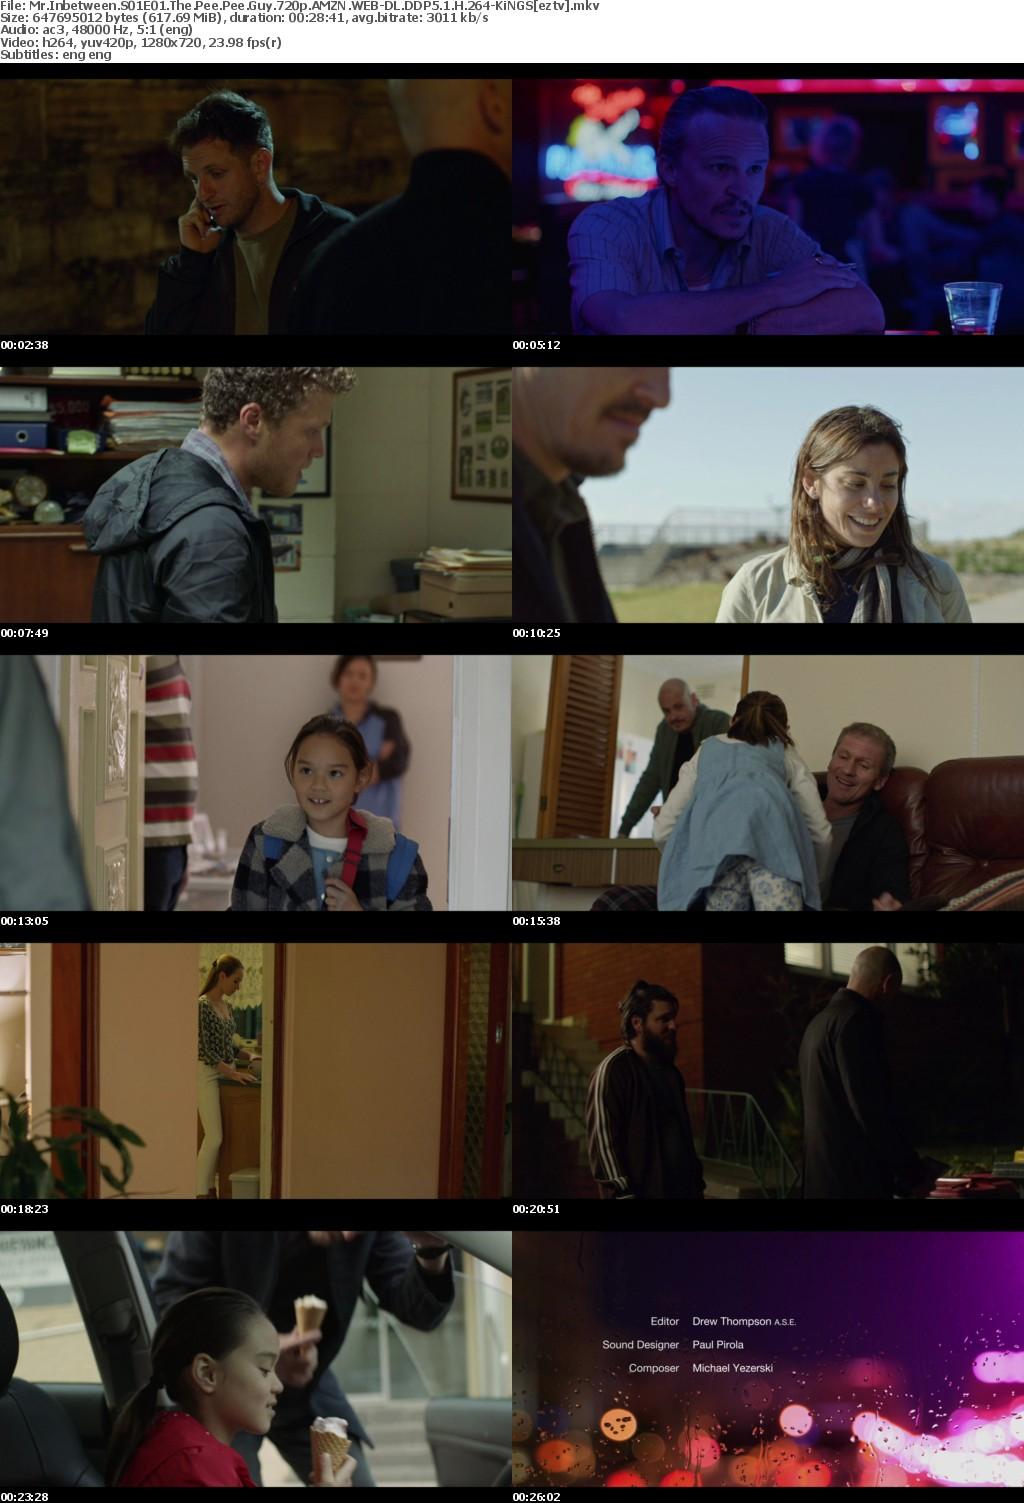 Mr Inbetween S01E01 The Pee Pee Guy 720p AMZN WEB-DL DDP5.1 H264-KiNGS